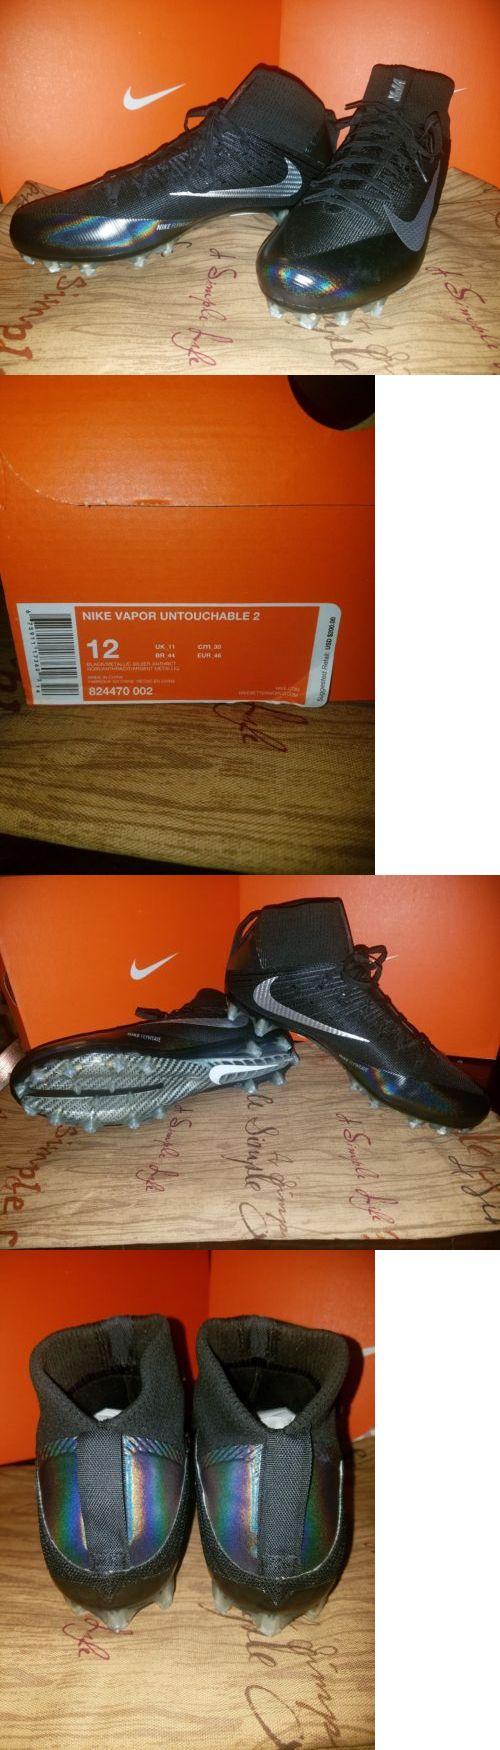 Men 159116: Nike Vapor Untouchable 2 Black Silver Football Cleats Size 12 -> BUY IT NOW ONLY: $70 on eBay!